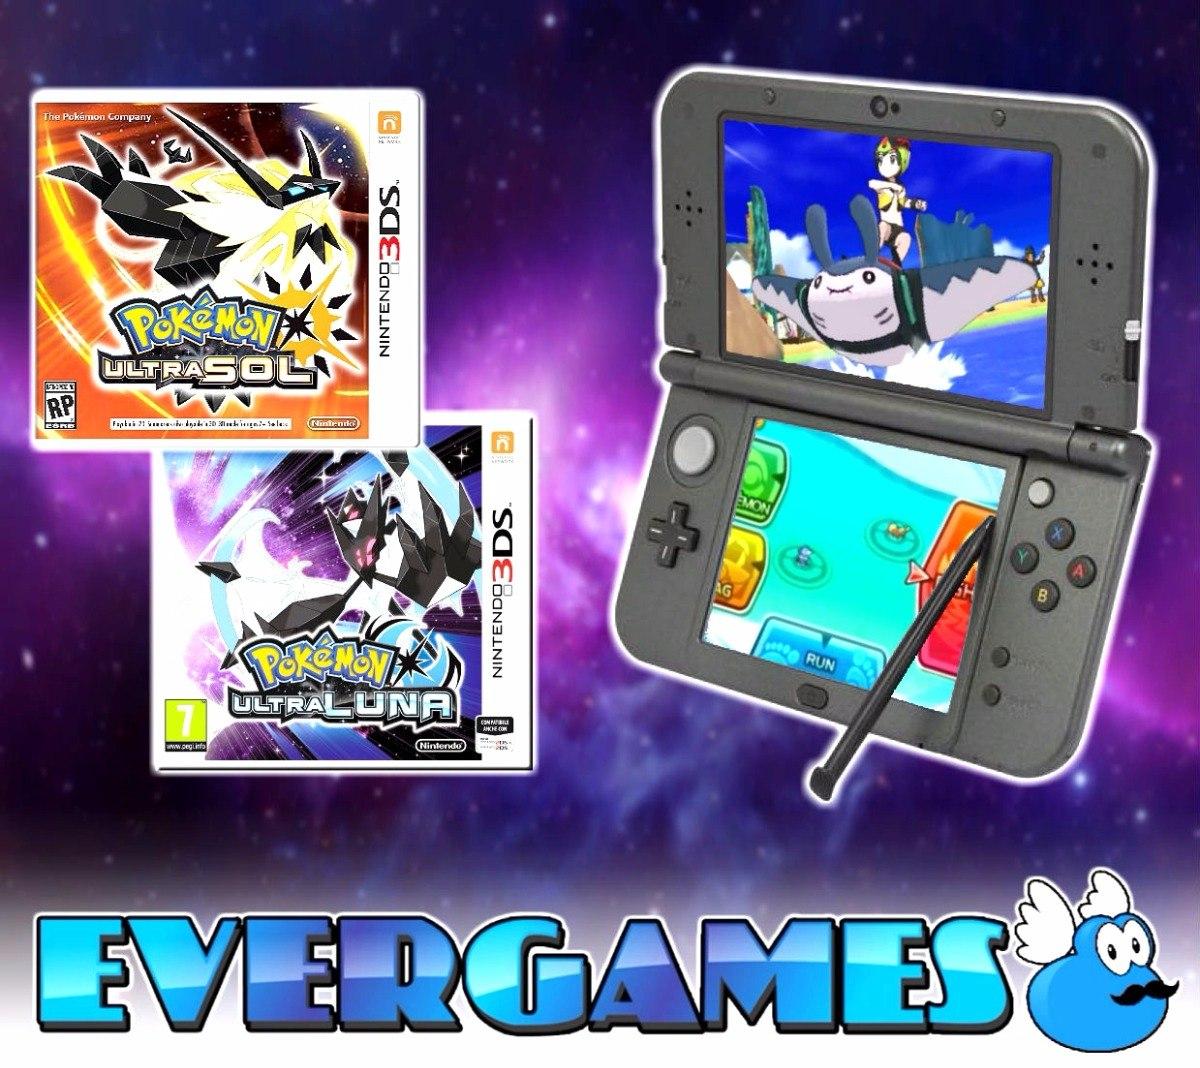 Nintendo 3ds Xl Juegos Evergames 7 399 00 En Mercado Libre